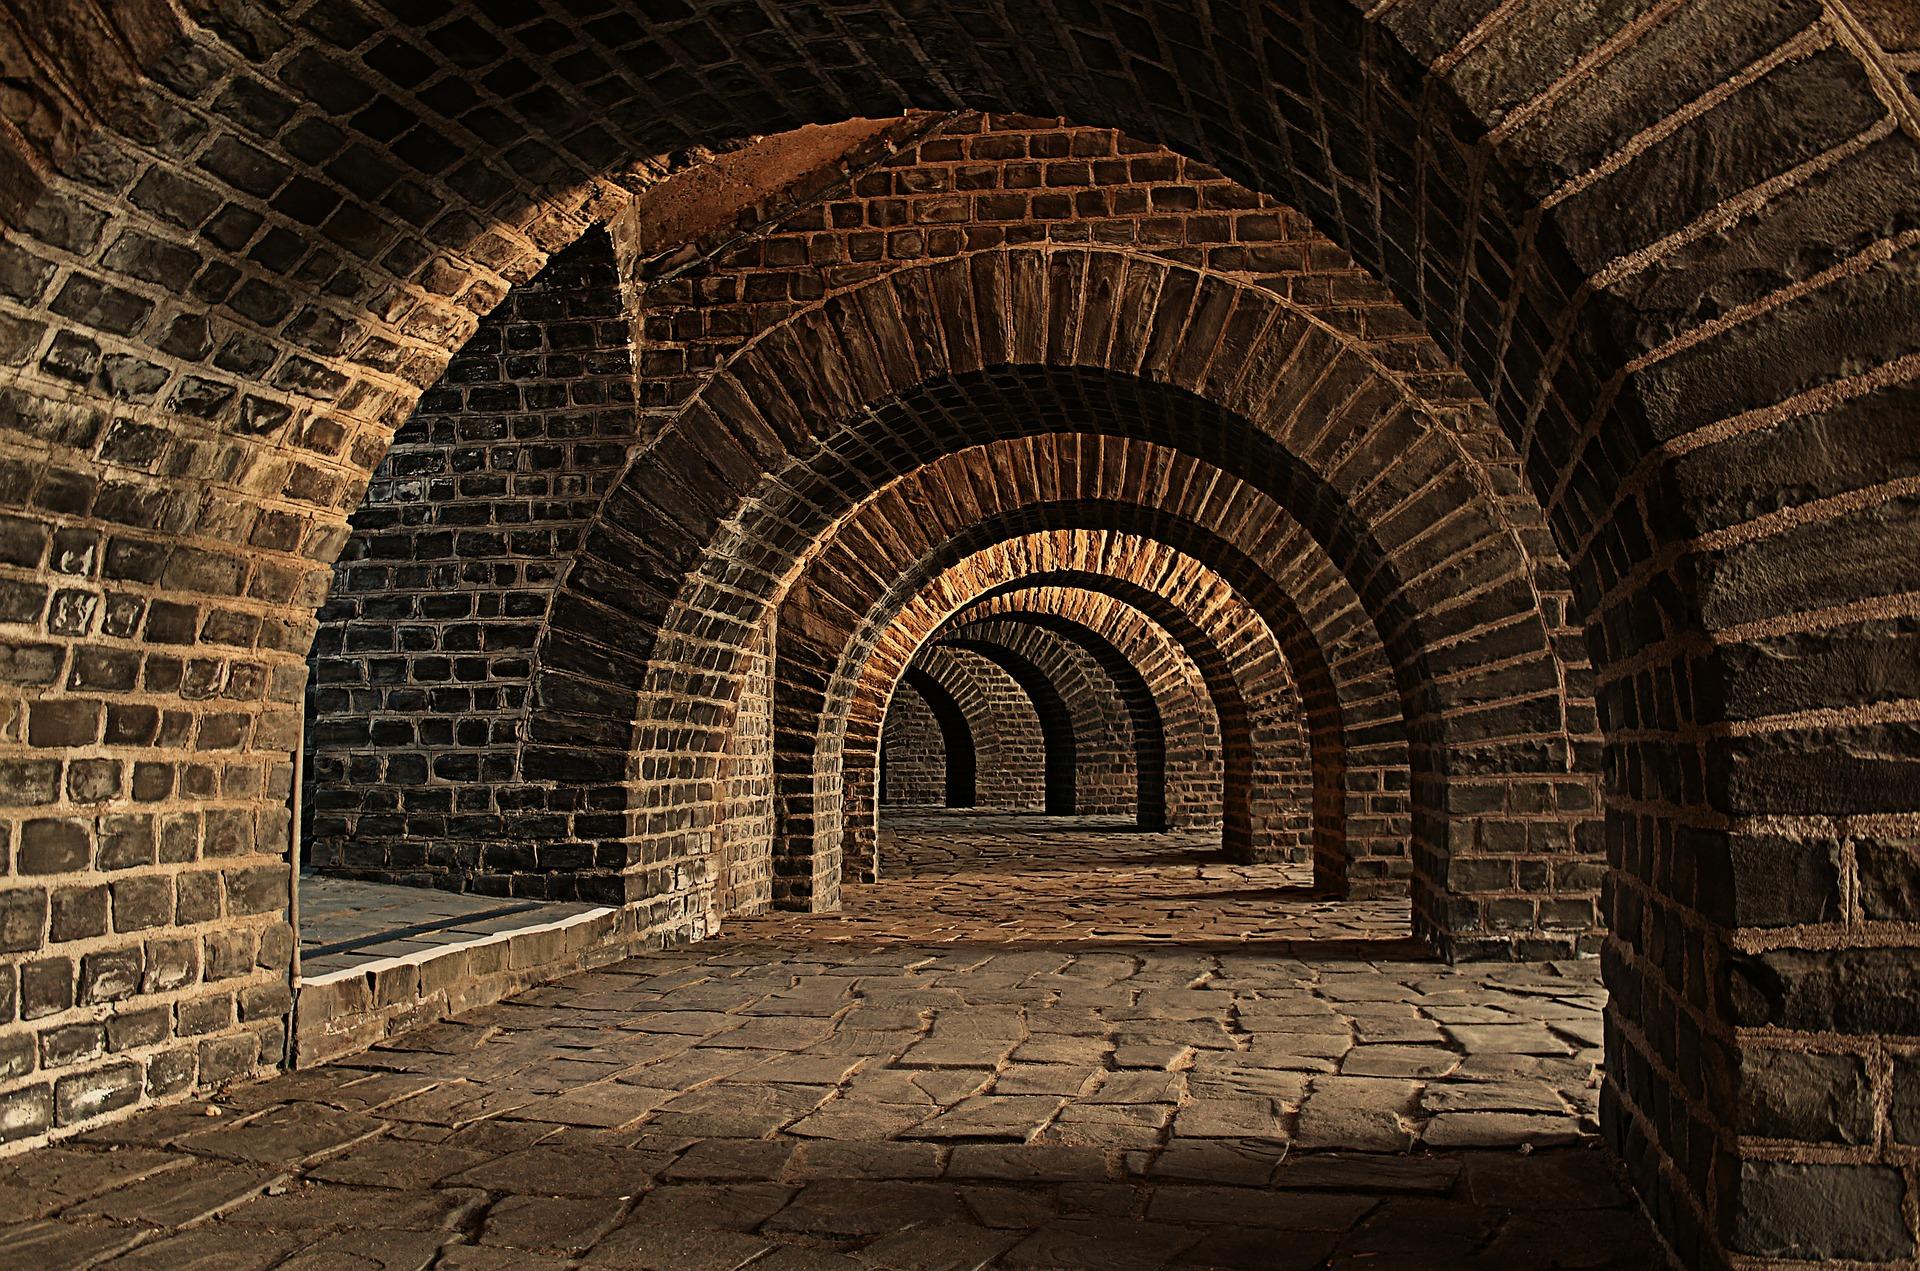 Tunnel 72F